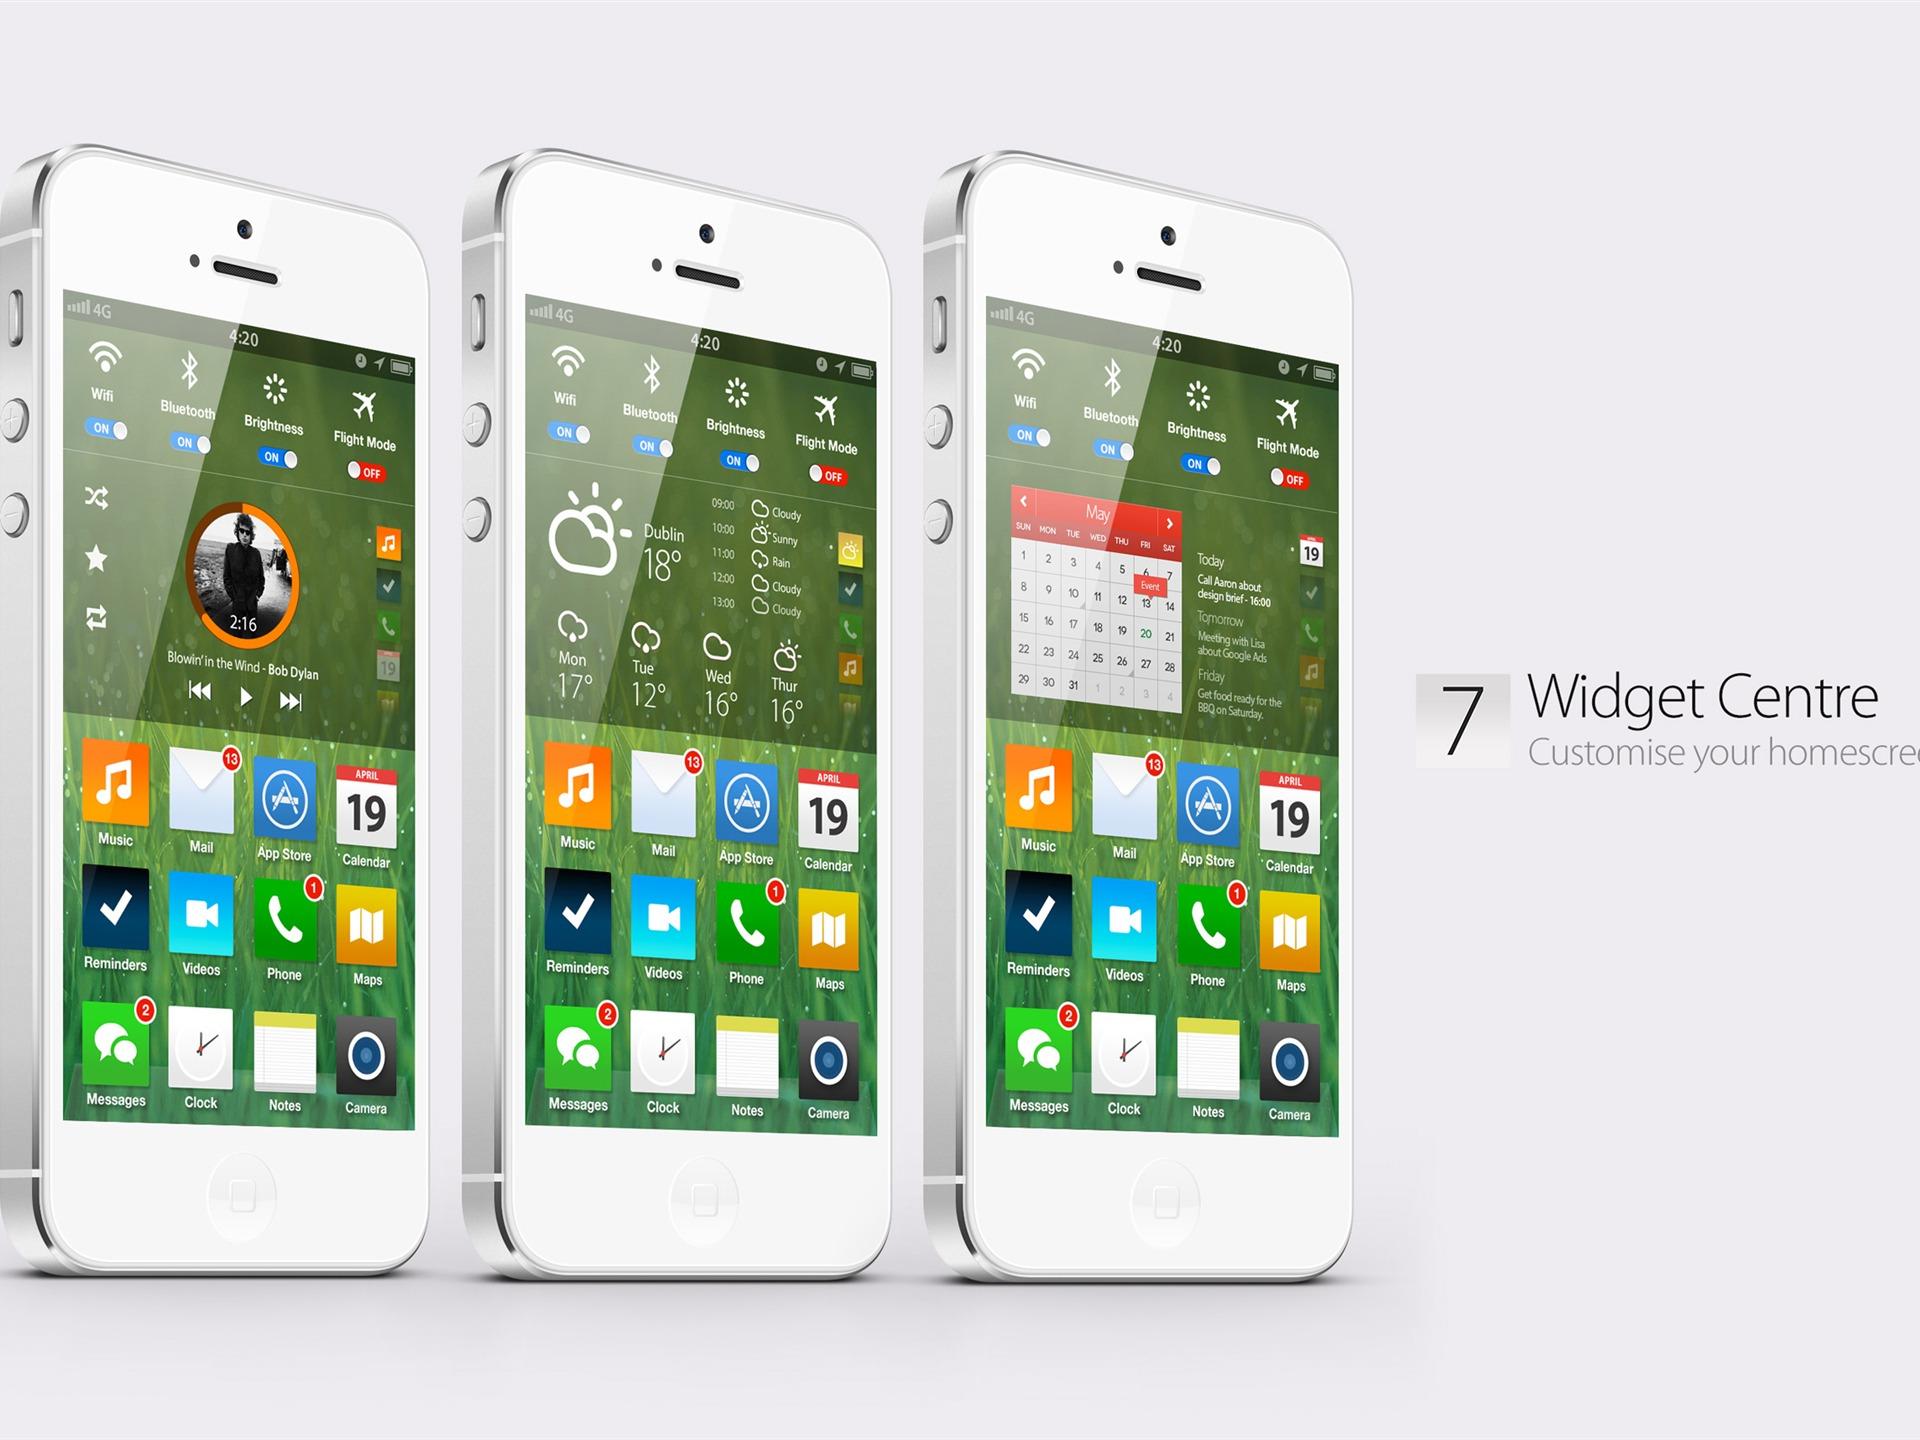 Ios 7 Iphone Wallpaper: Apple IOS 7 IPhone HD Widescreen Wallpaper 04-1920x1440